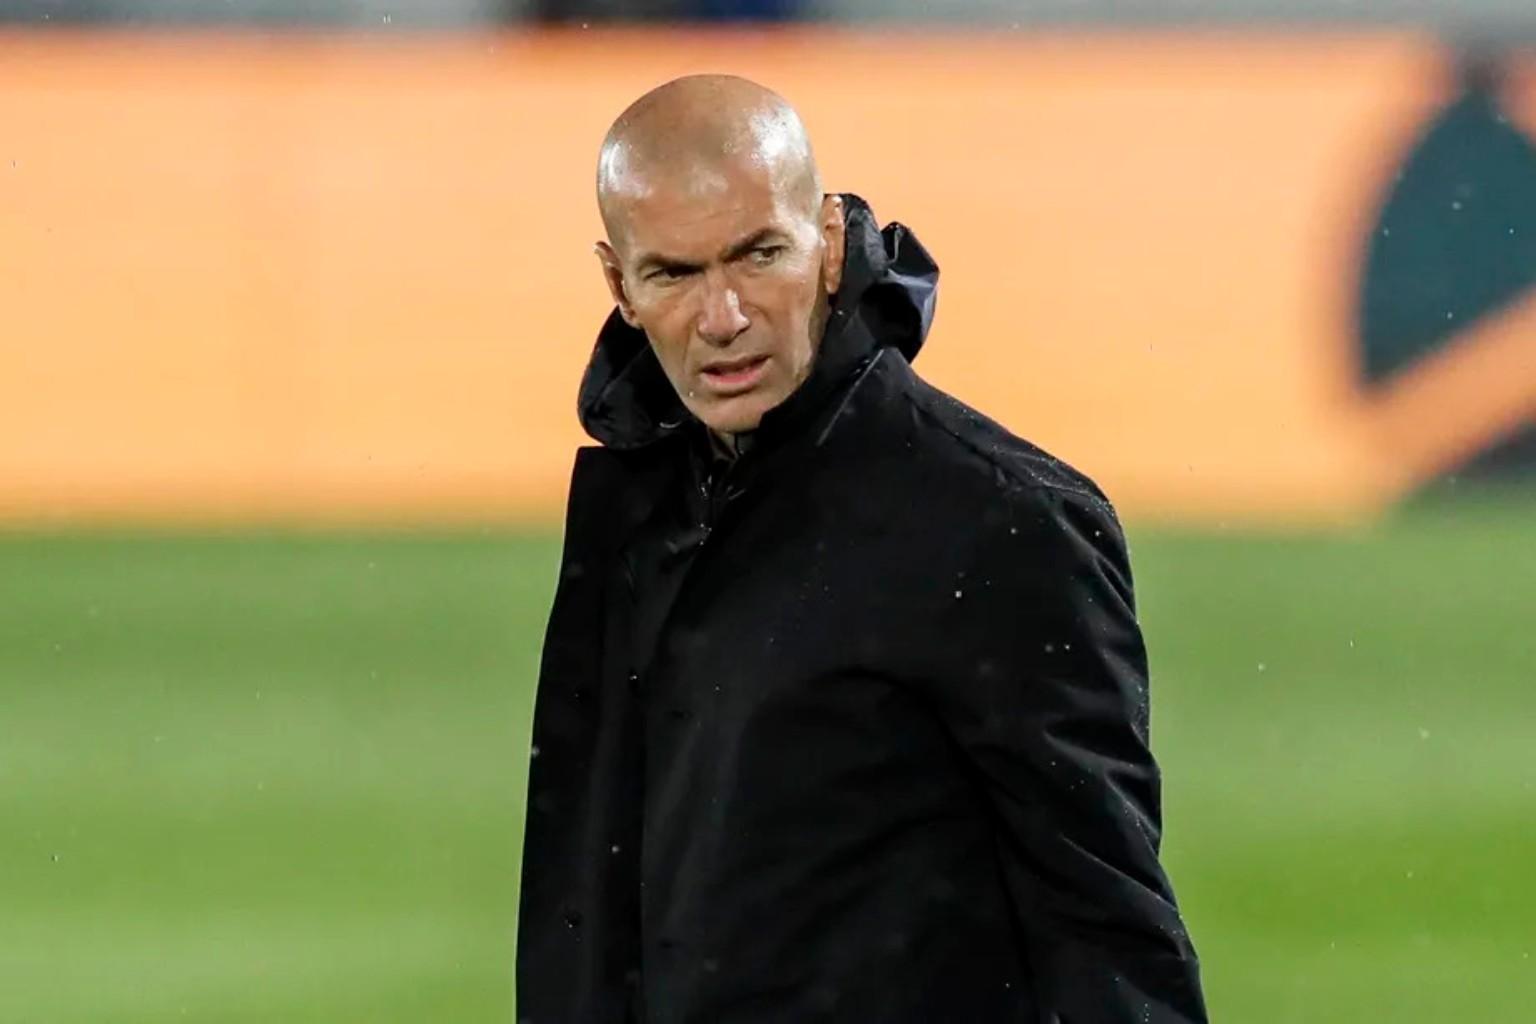 Zinedine Zidane leaves real madrid again